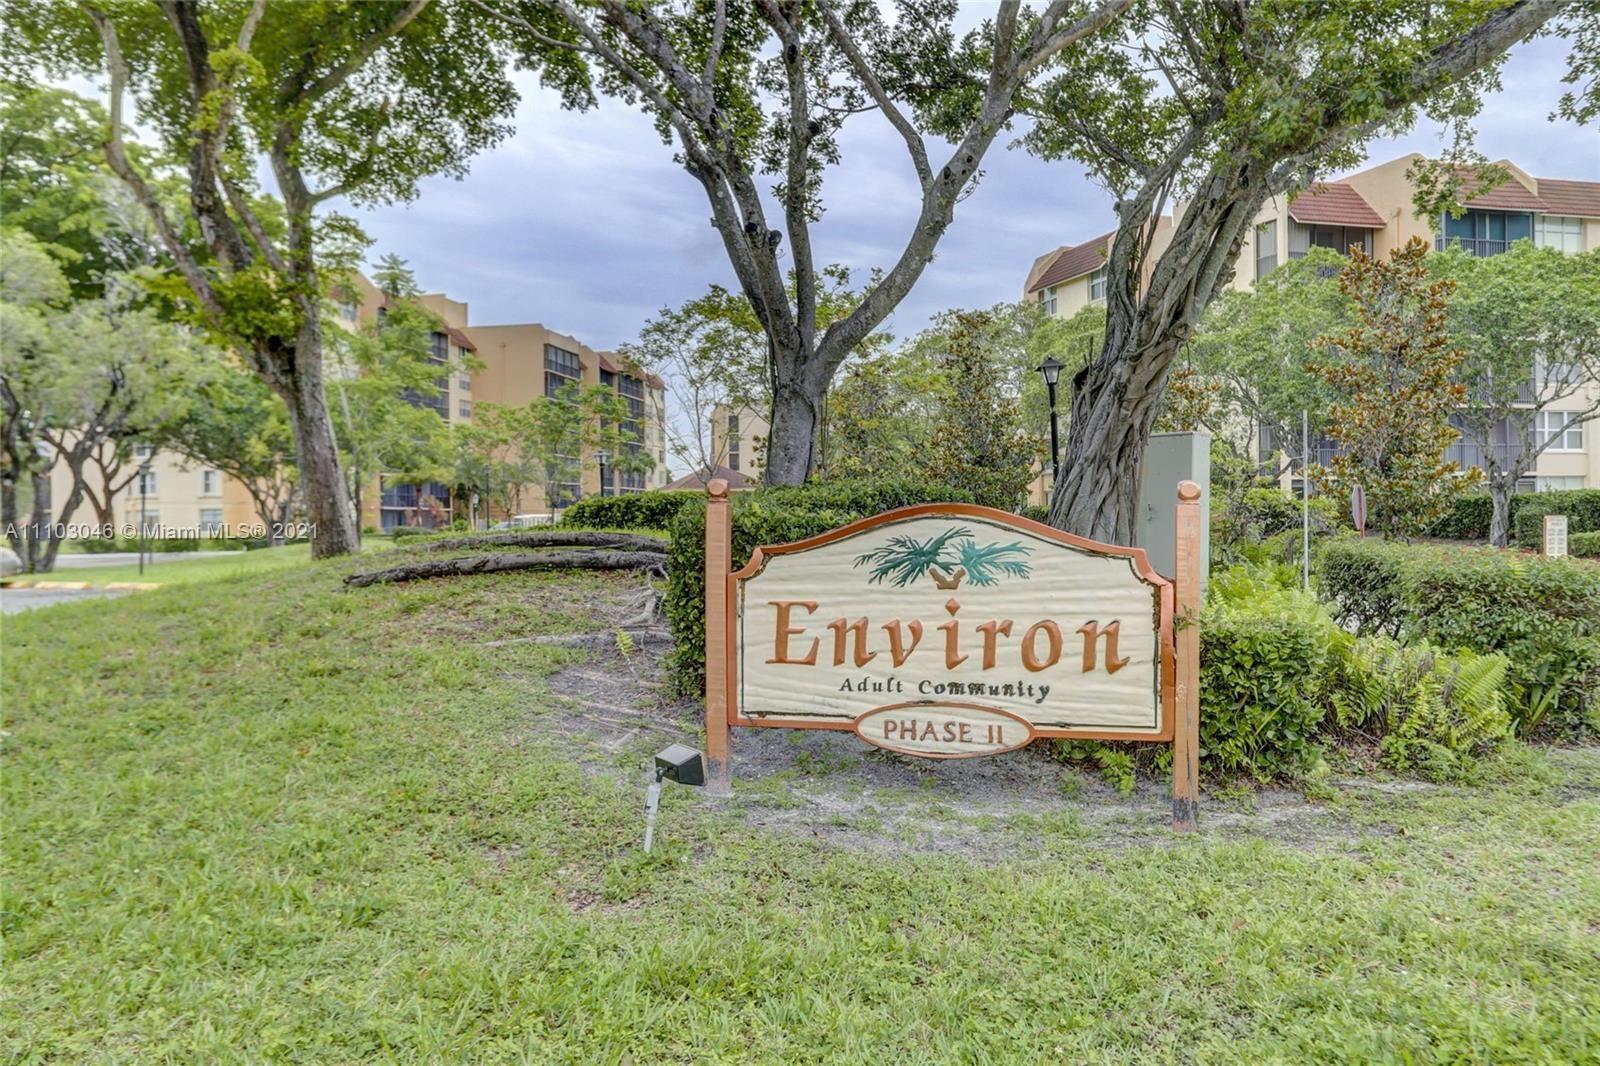 Photo of 3841 Environ Blvd #130, Lauderhill, FL 33319 (MLS # A11103046)